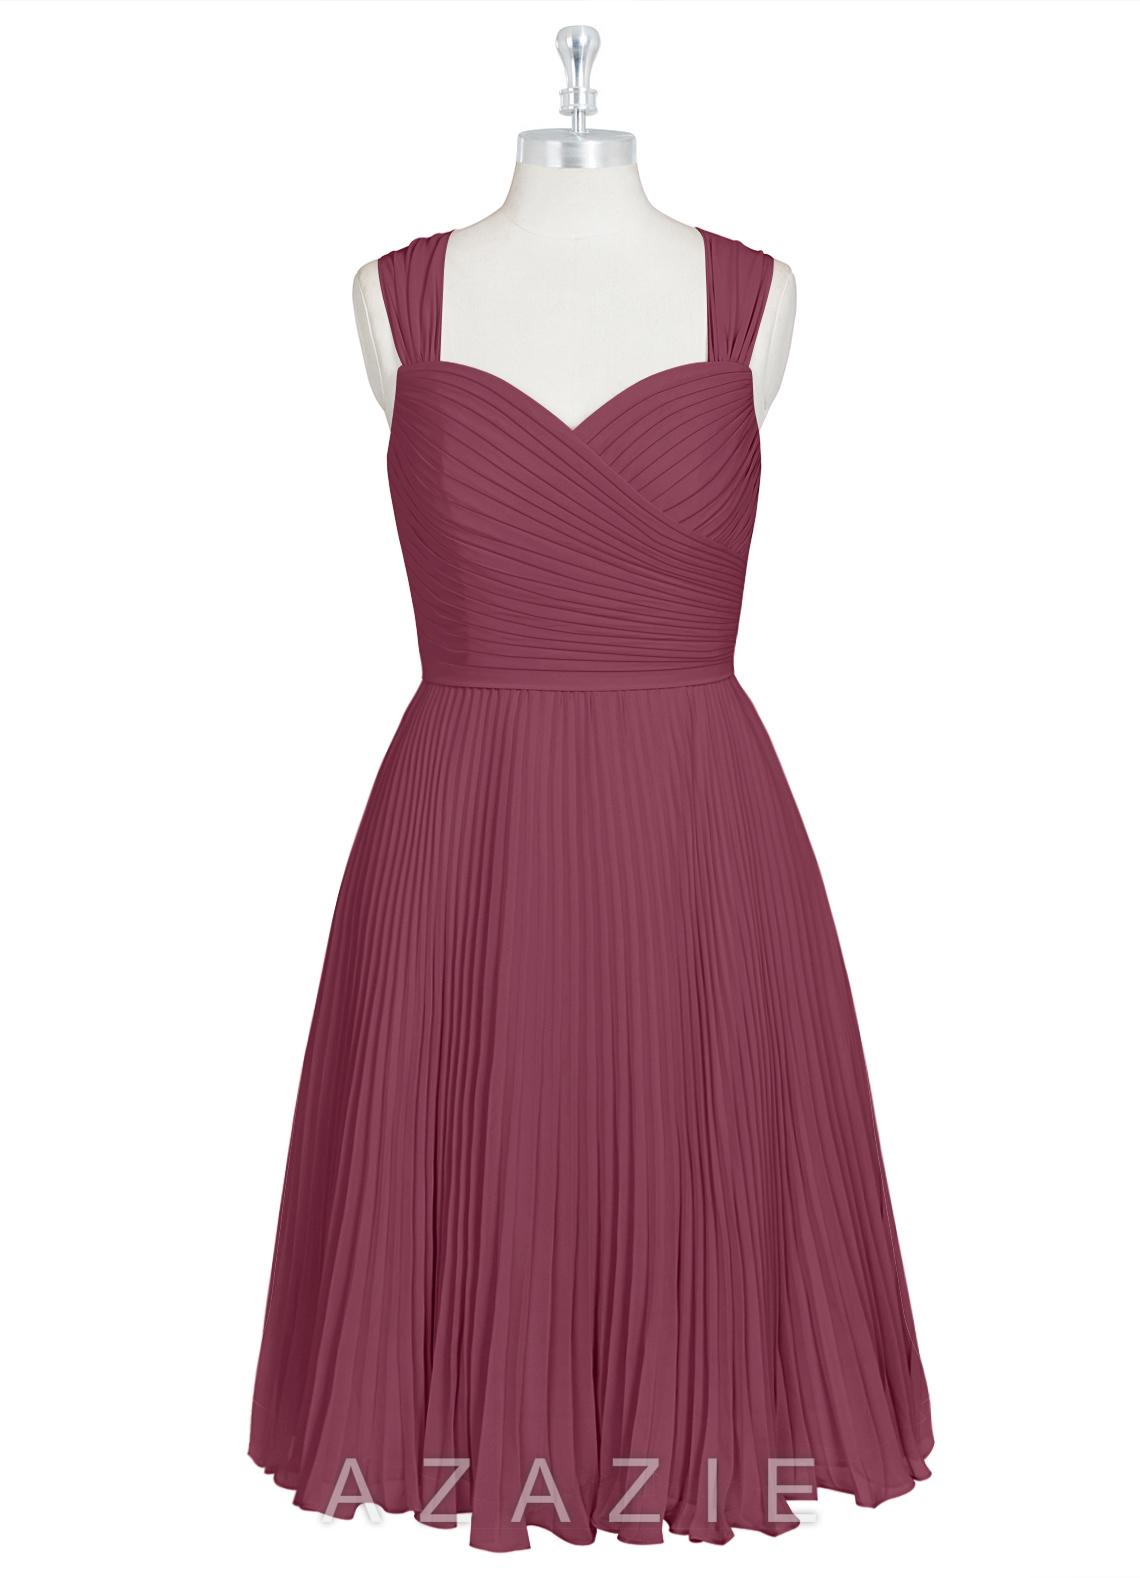 0b7f57b493303 Azazie Alana Bridesmaid Dress | Azazie